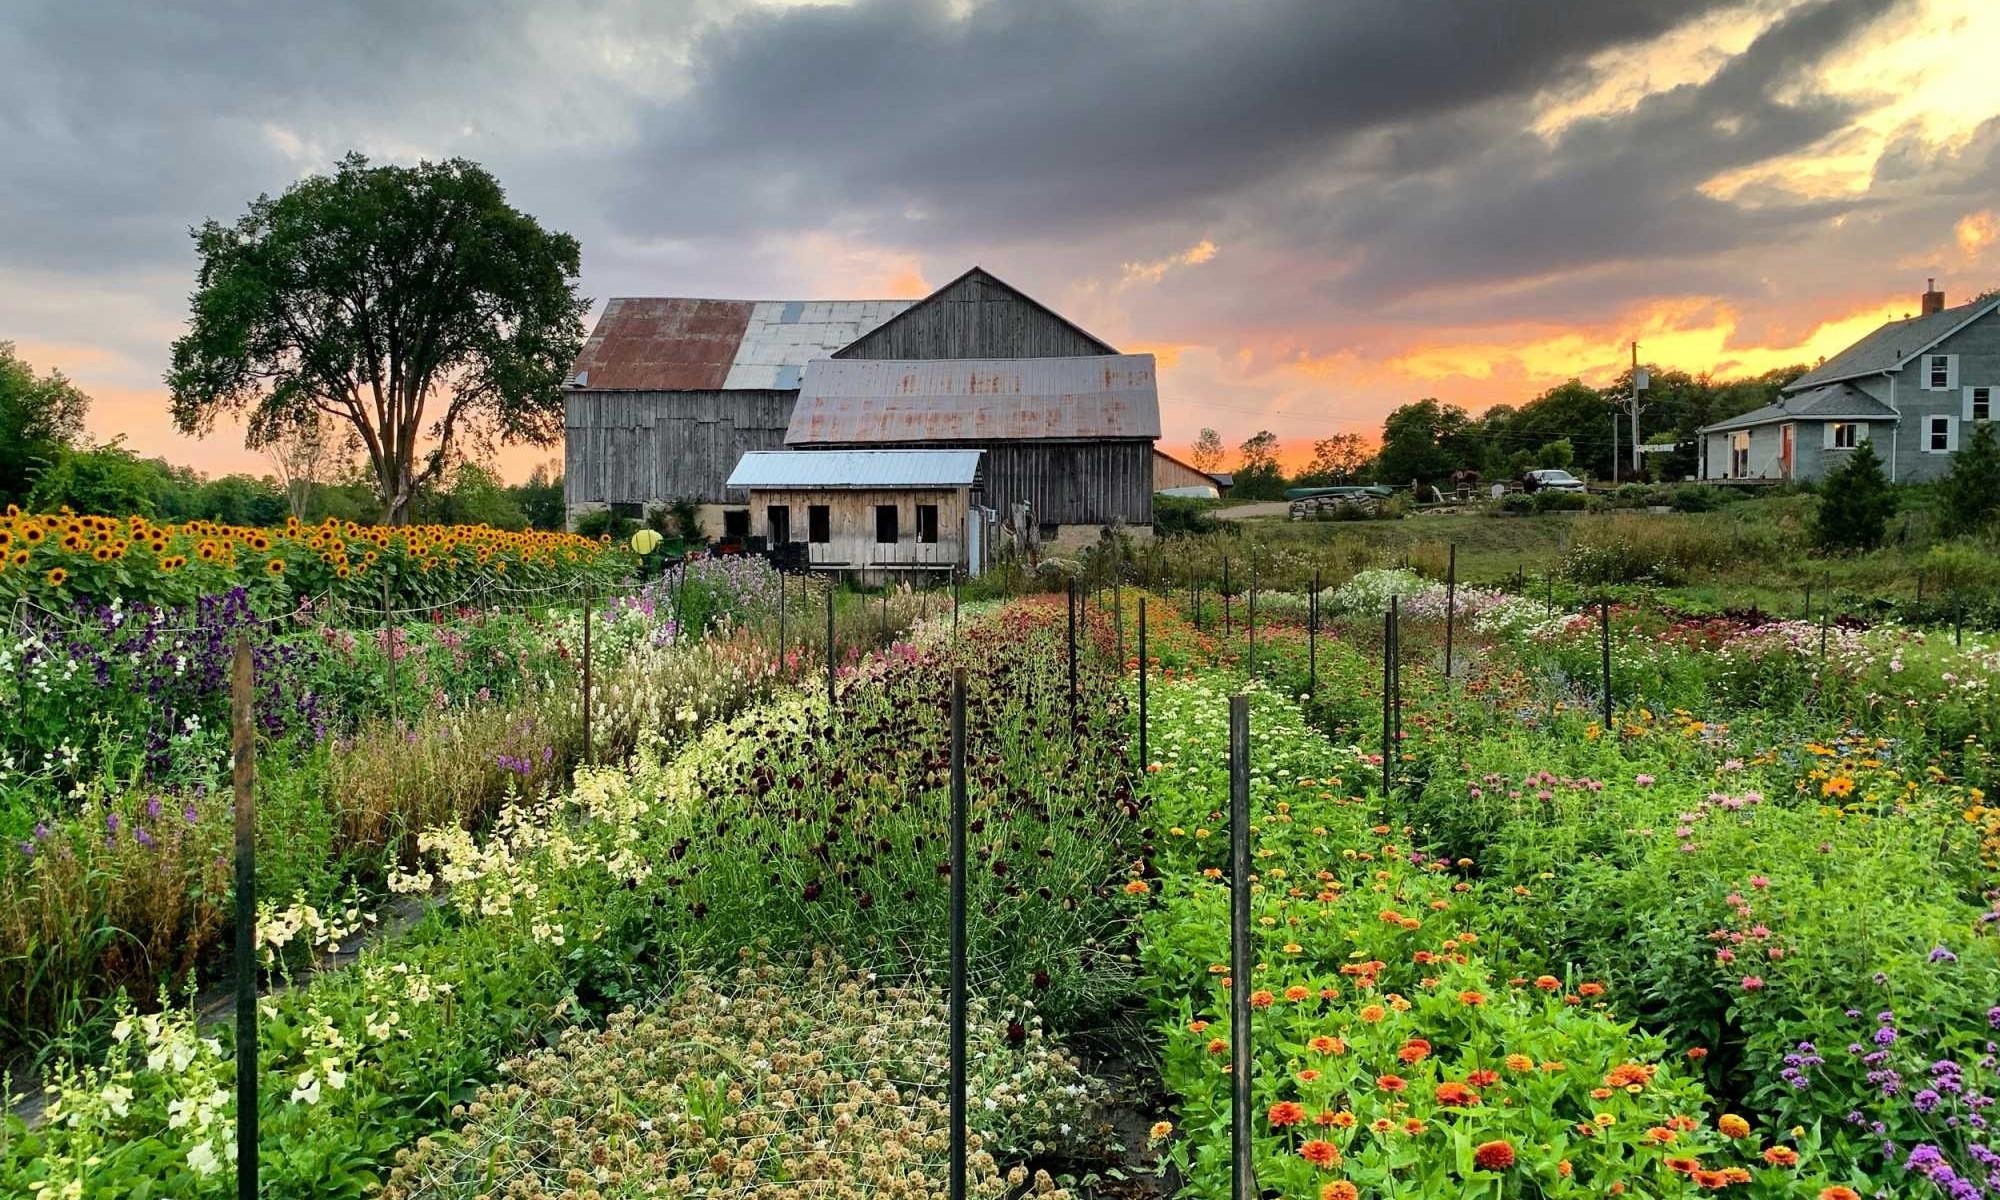 Sideroad Farm